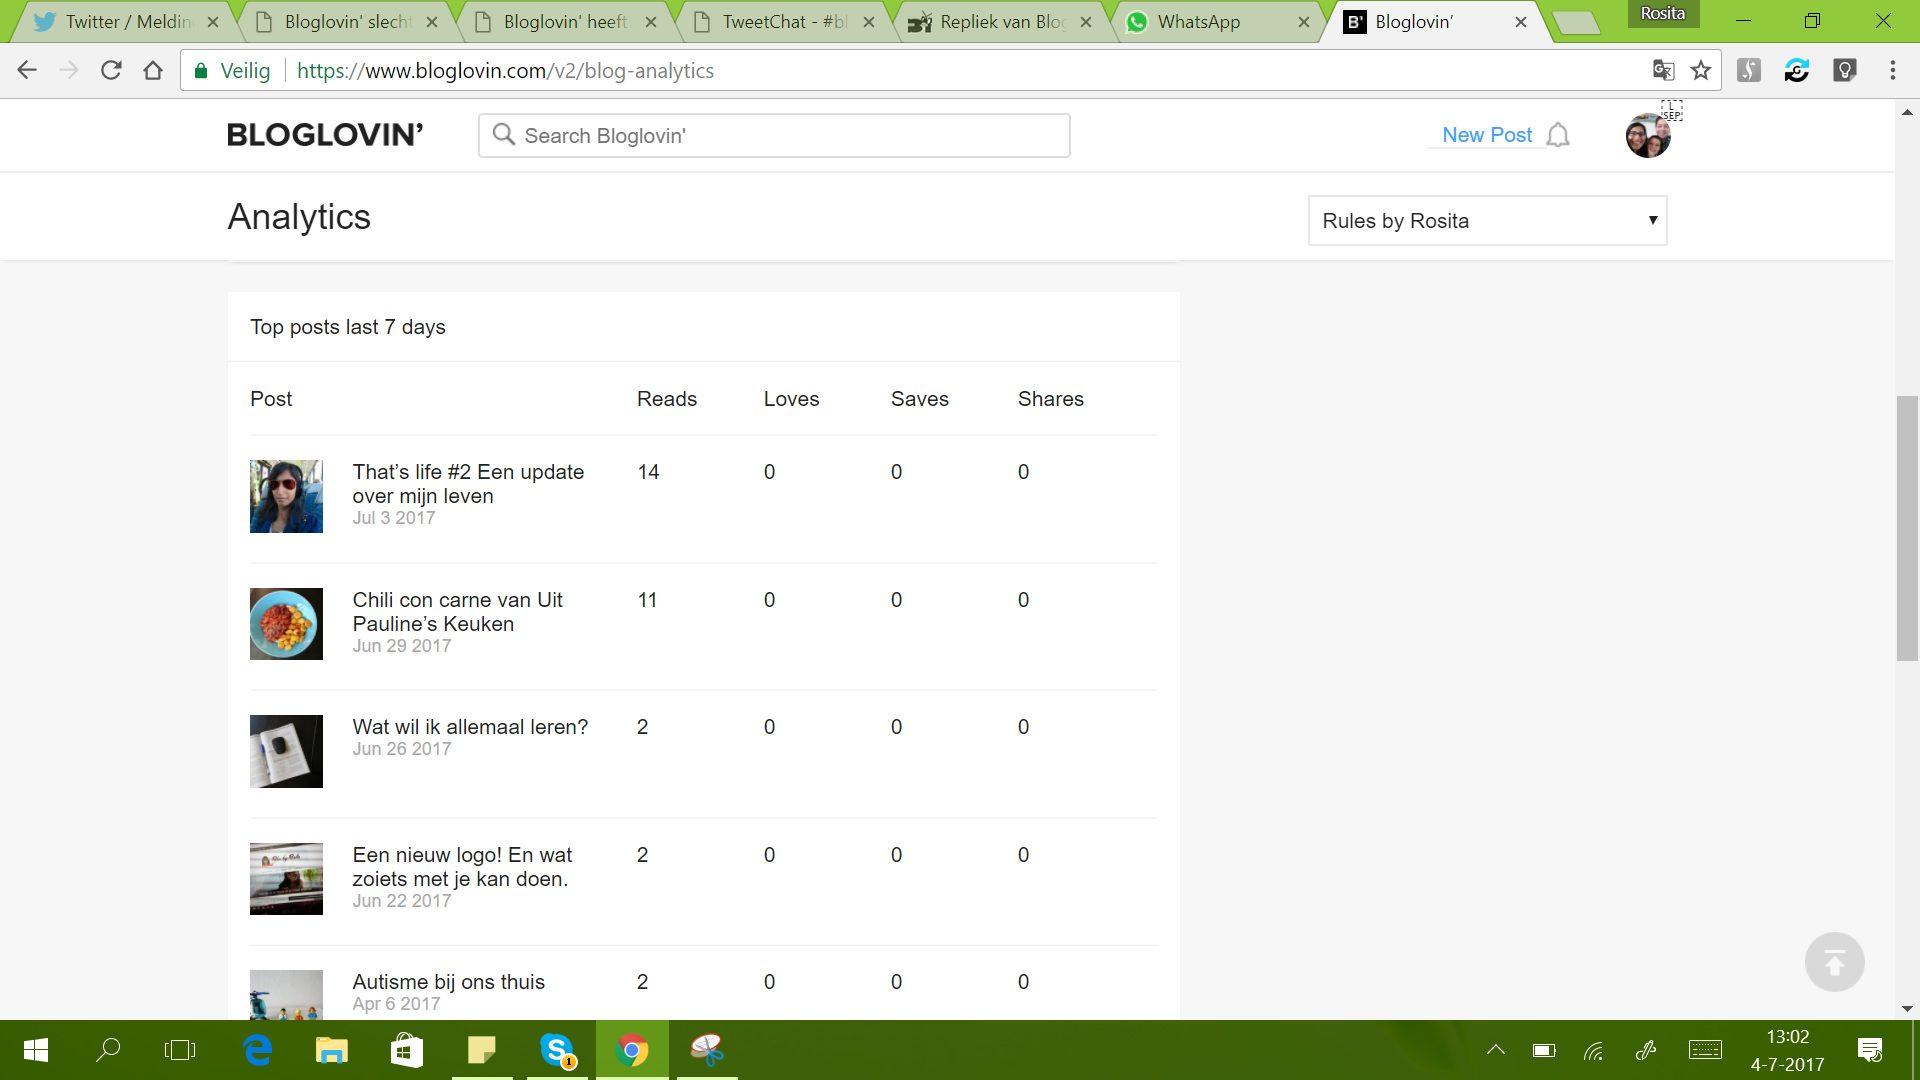 Mijn statistieken in Bloglovin'